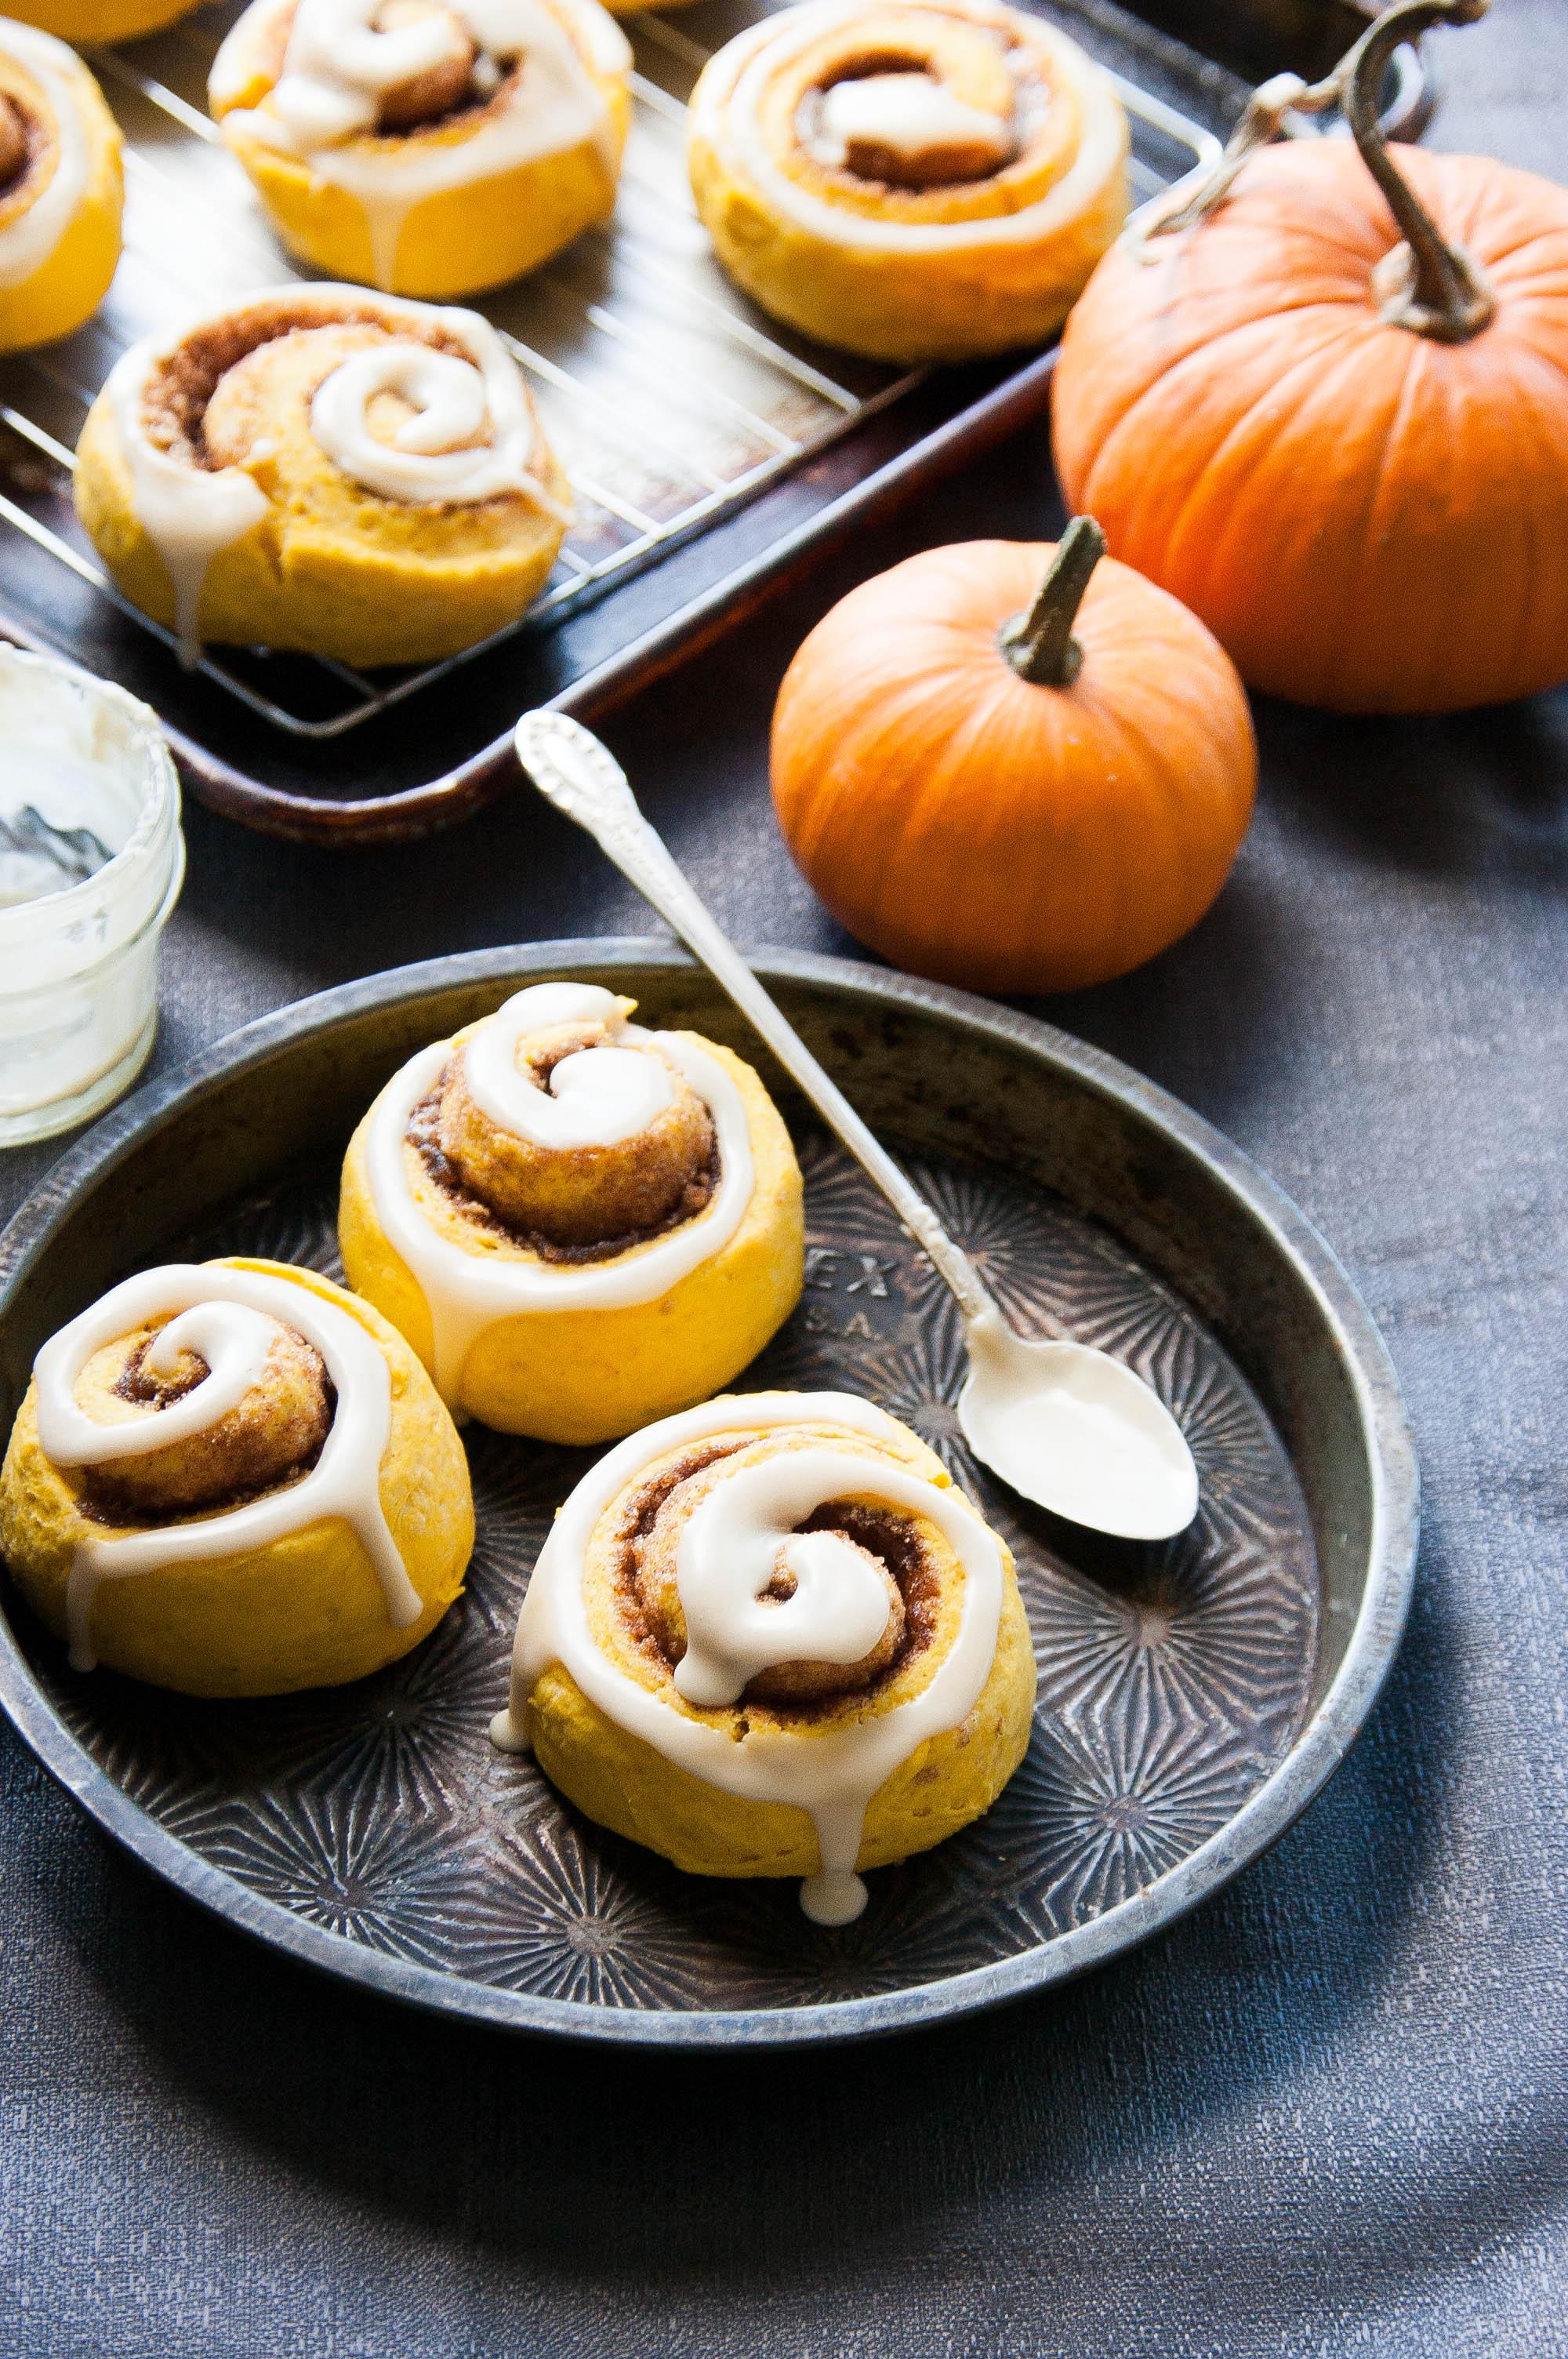 Maple-glazed Pumpkin Cinnamon Roll Scones - The Kitchen McCabe